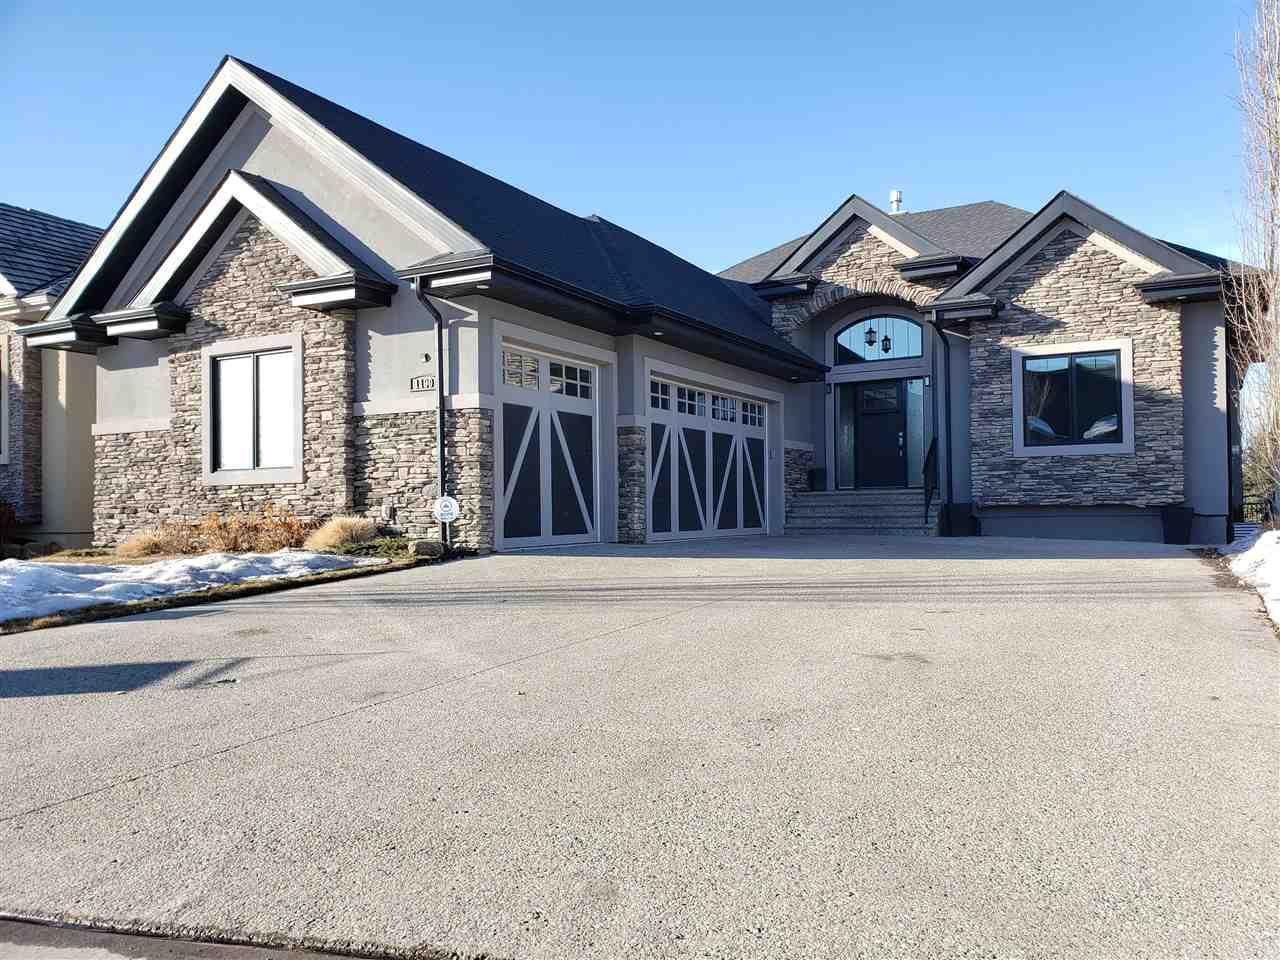 Main Photo: 1190 Adamson Drive in Edmonton: Zone 55 House for sale : MLS®# E4230912